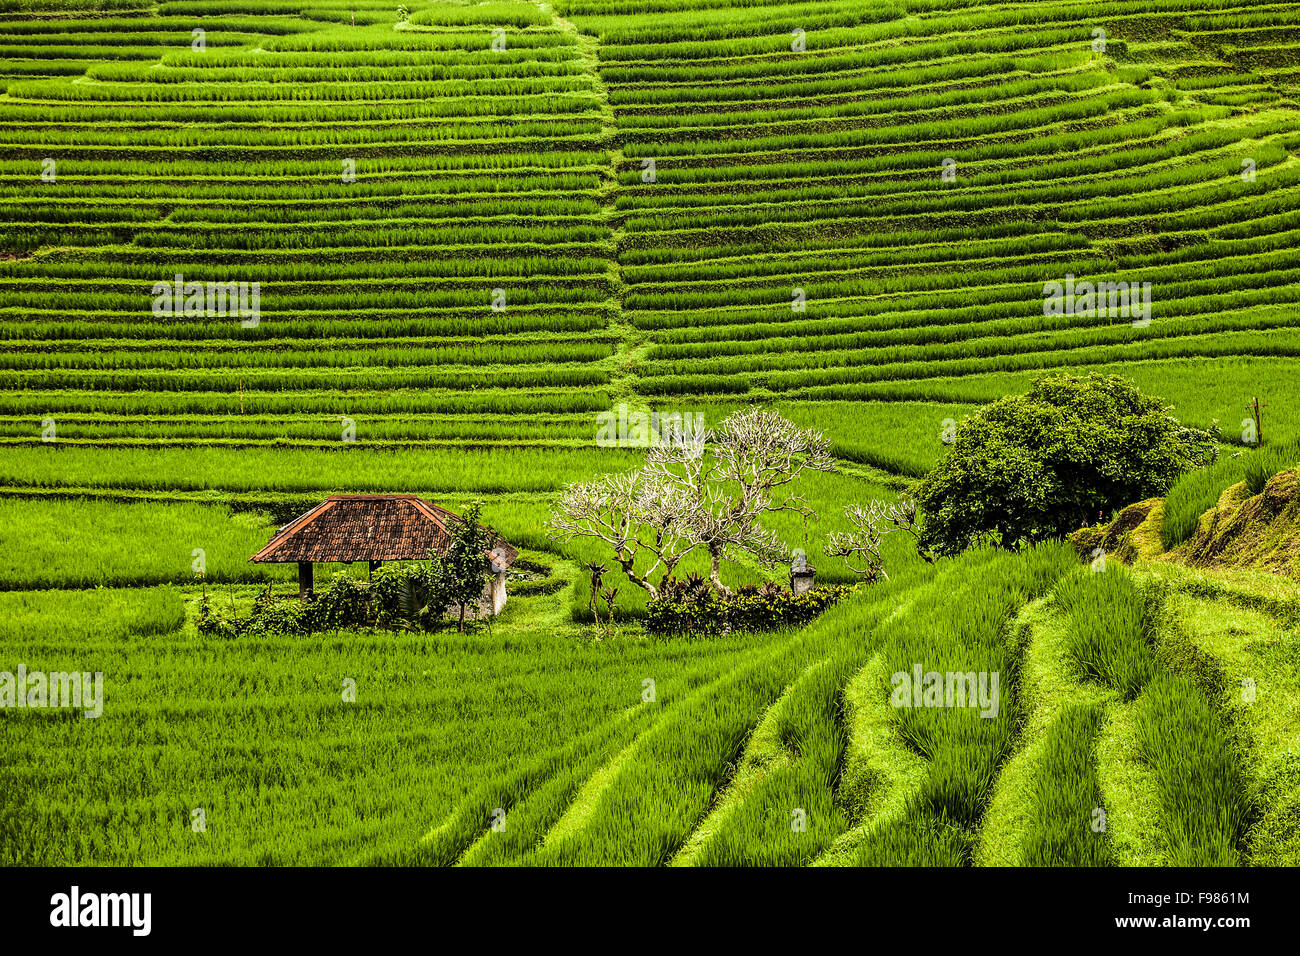 Rice terraces on Bali - Stock Image